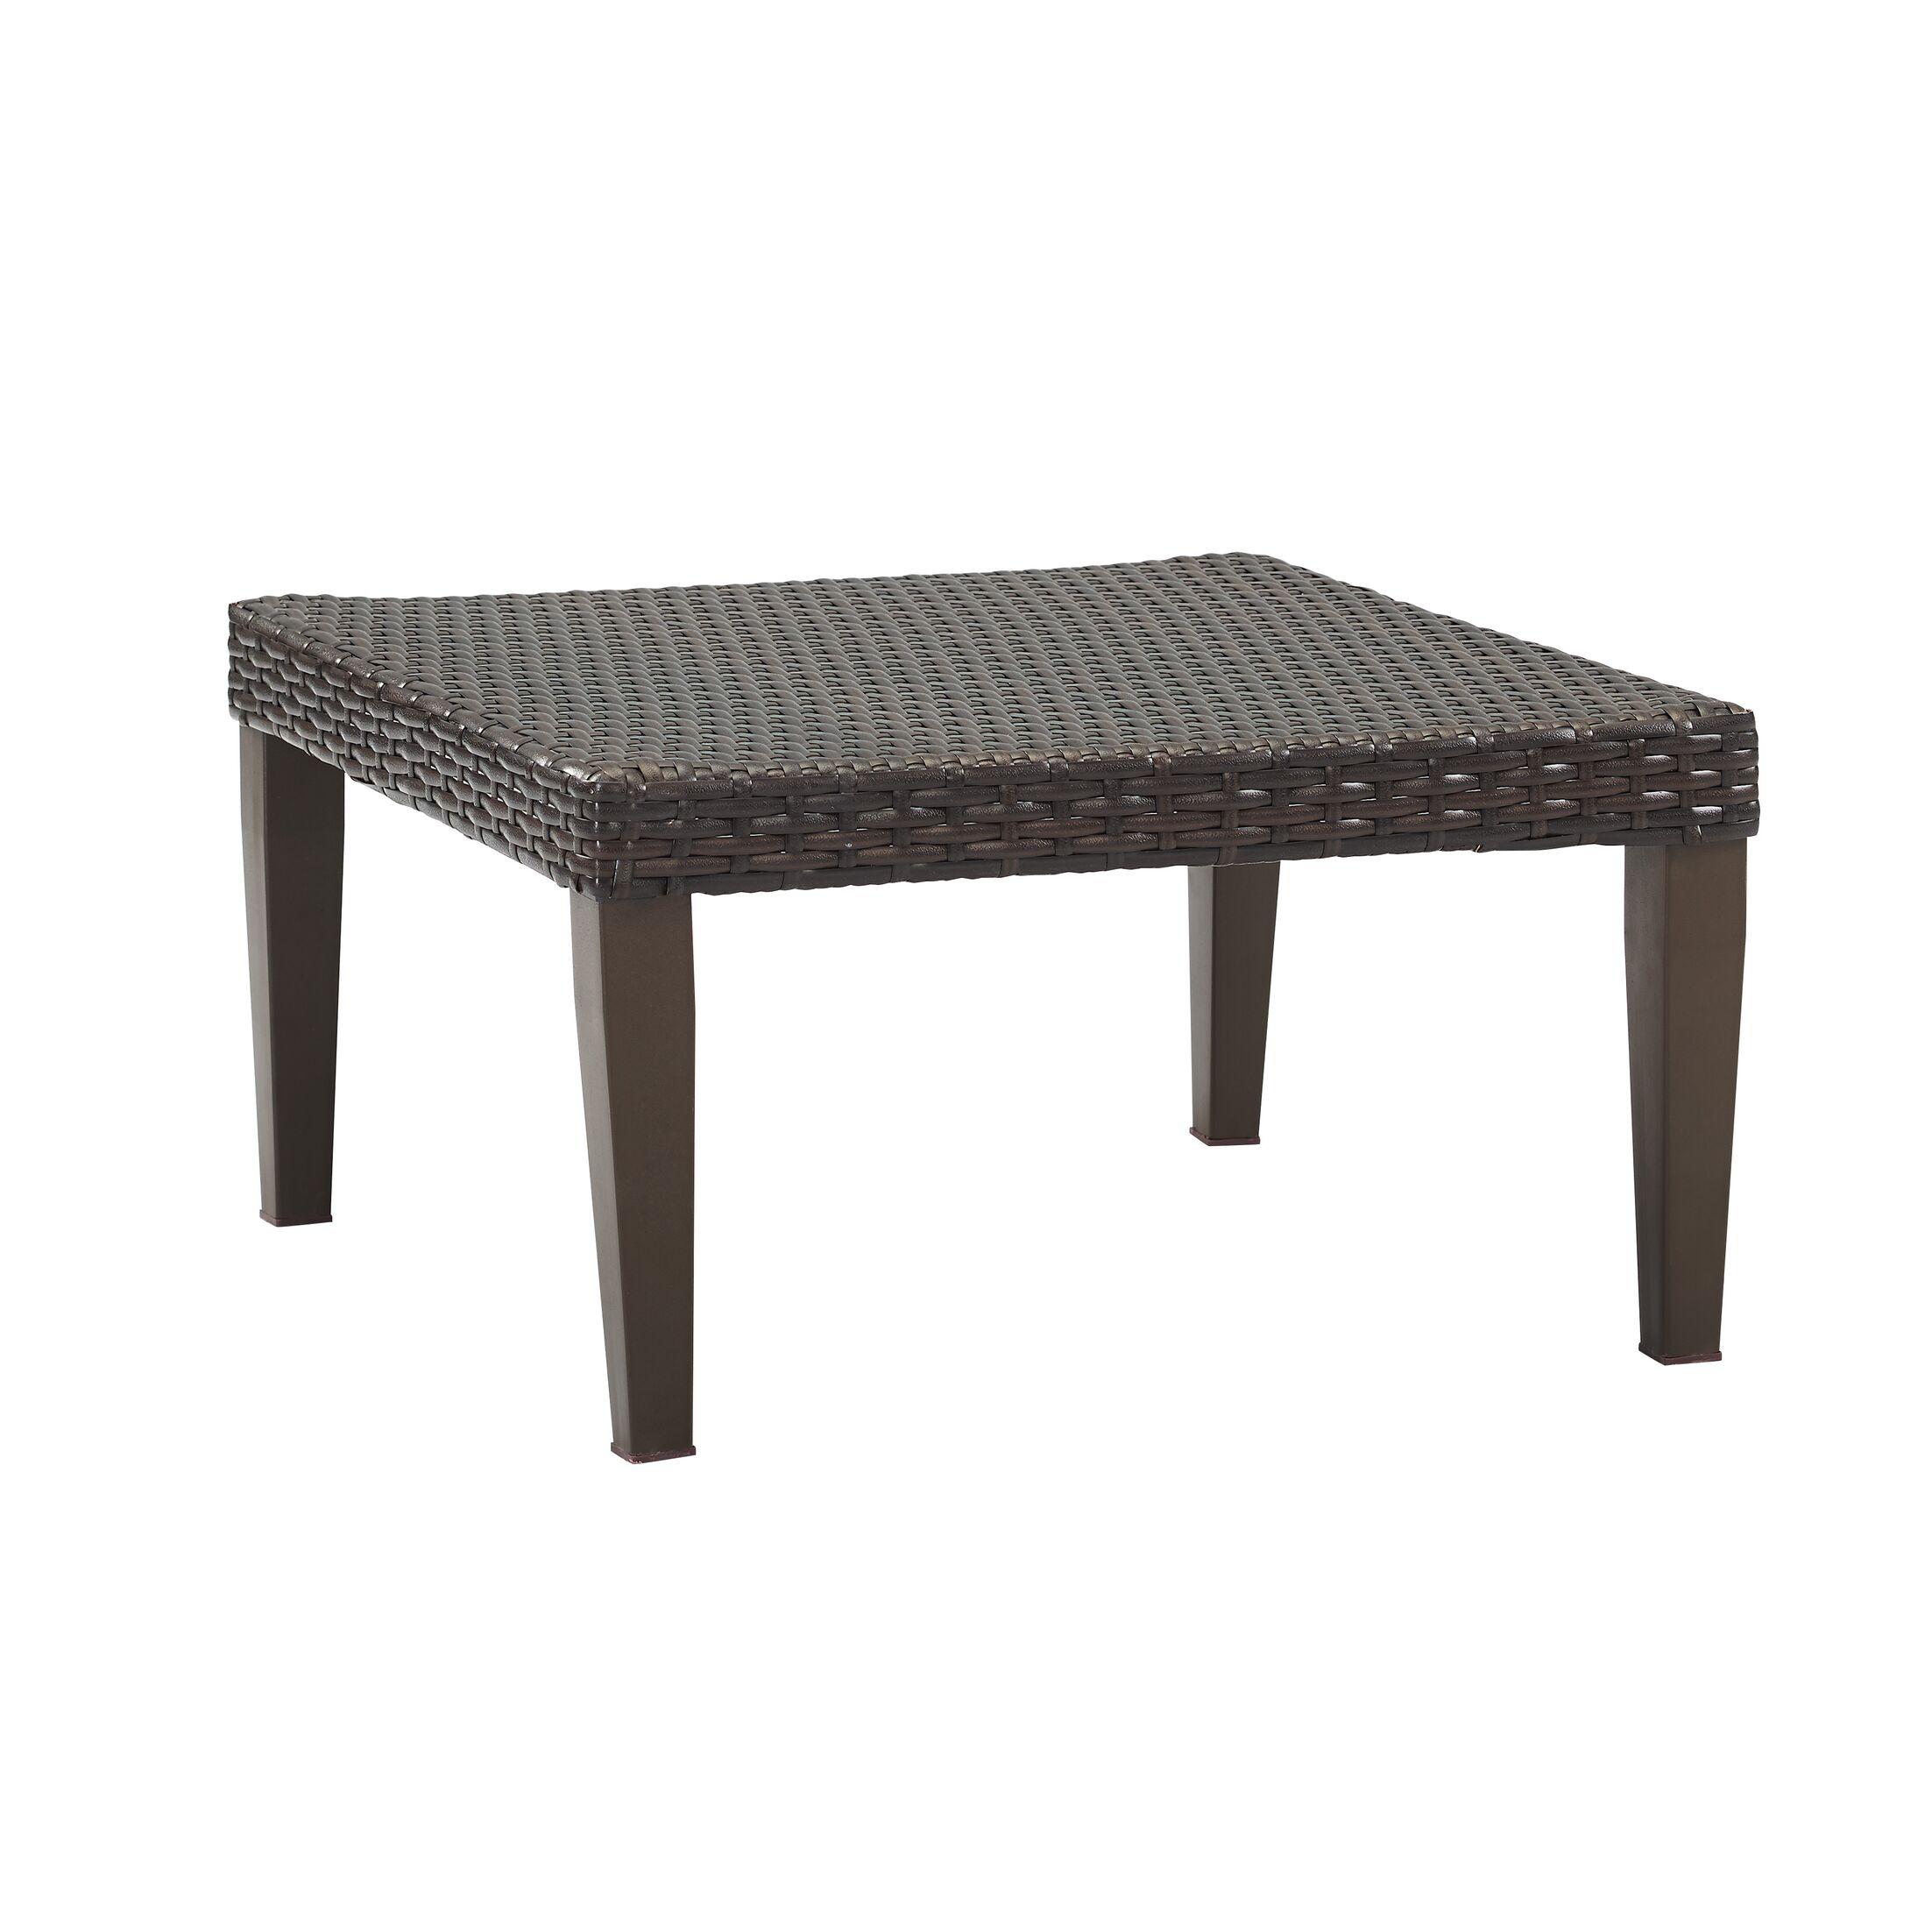 Fenwick Landing 6 Piece Rattan Sectional Set with Cushions Fabric: Tan